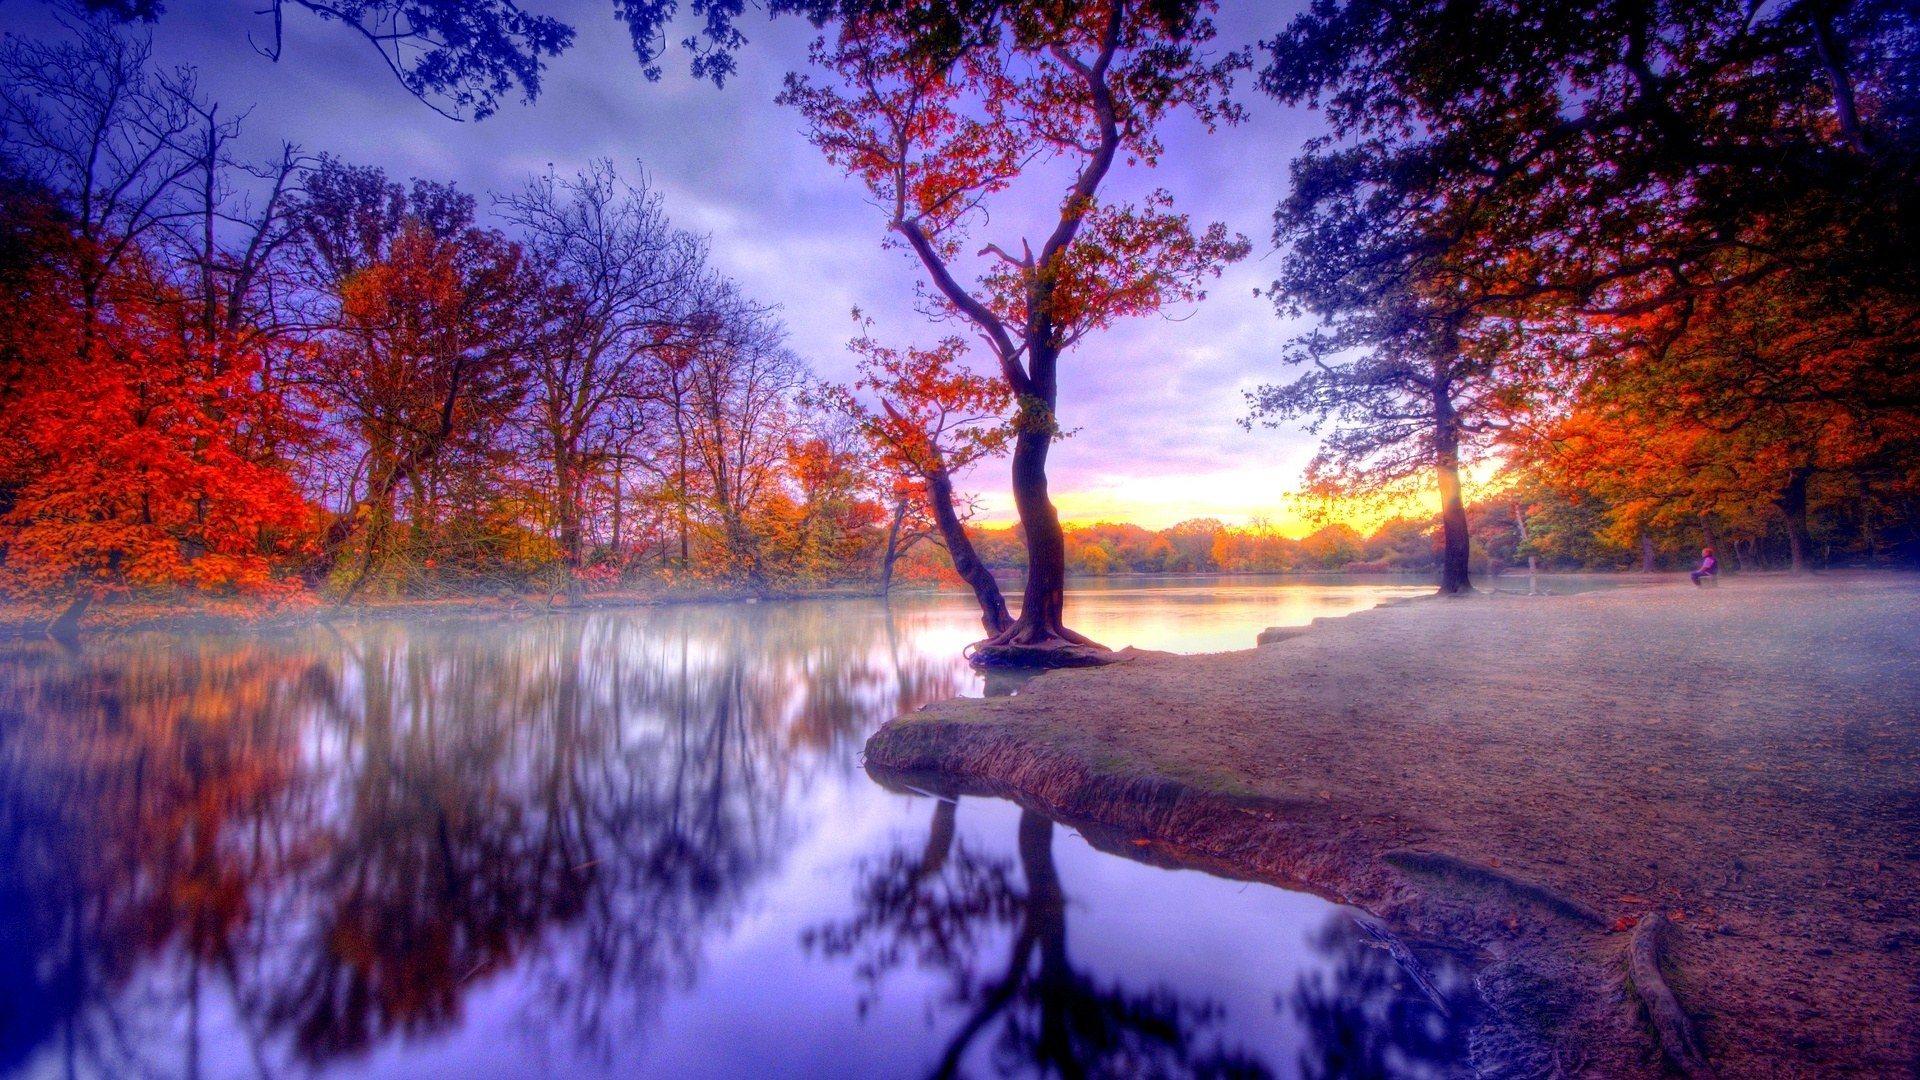 Autumn Landscape Full HD Desktop Wallpapers 1080p 1920x1080